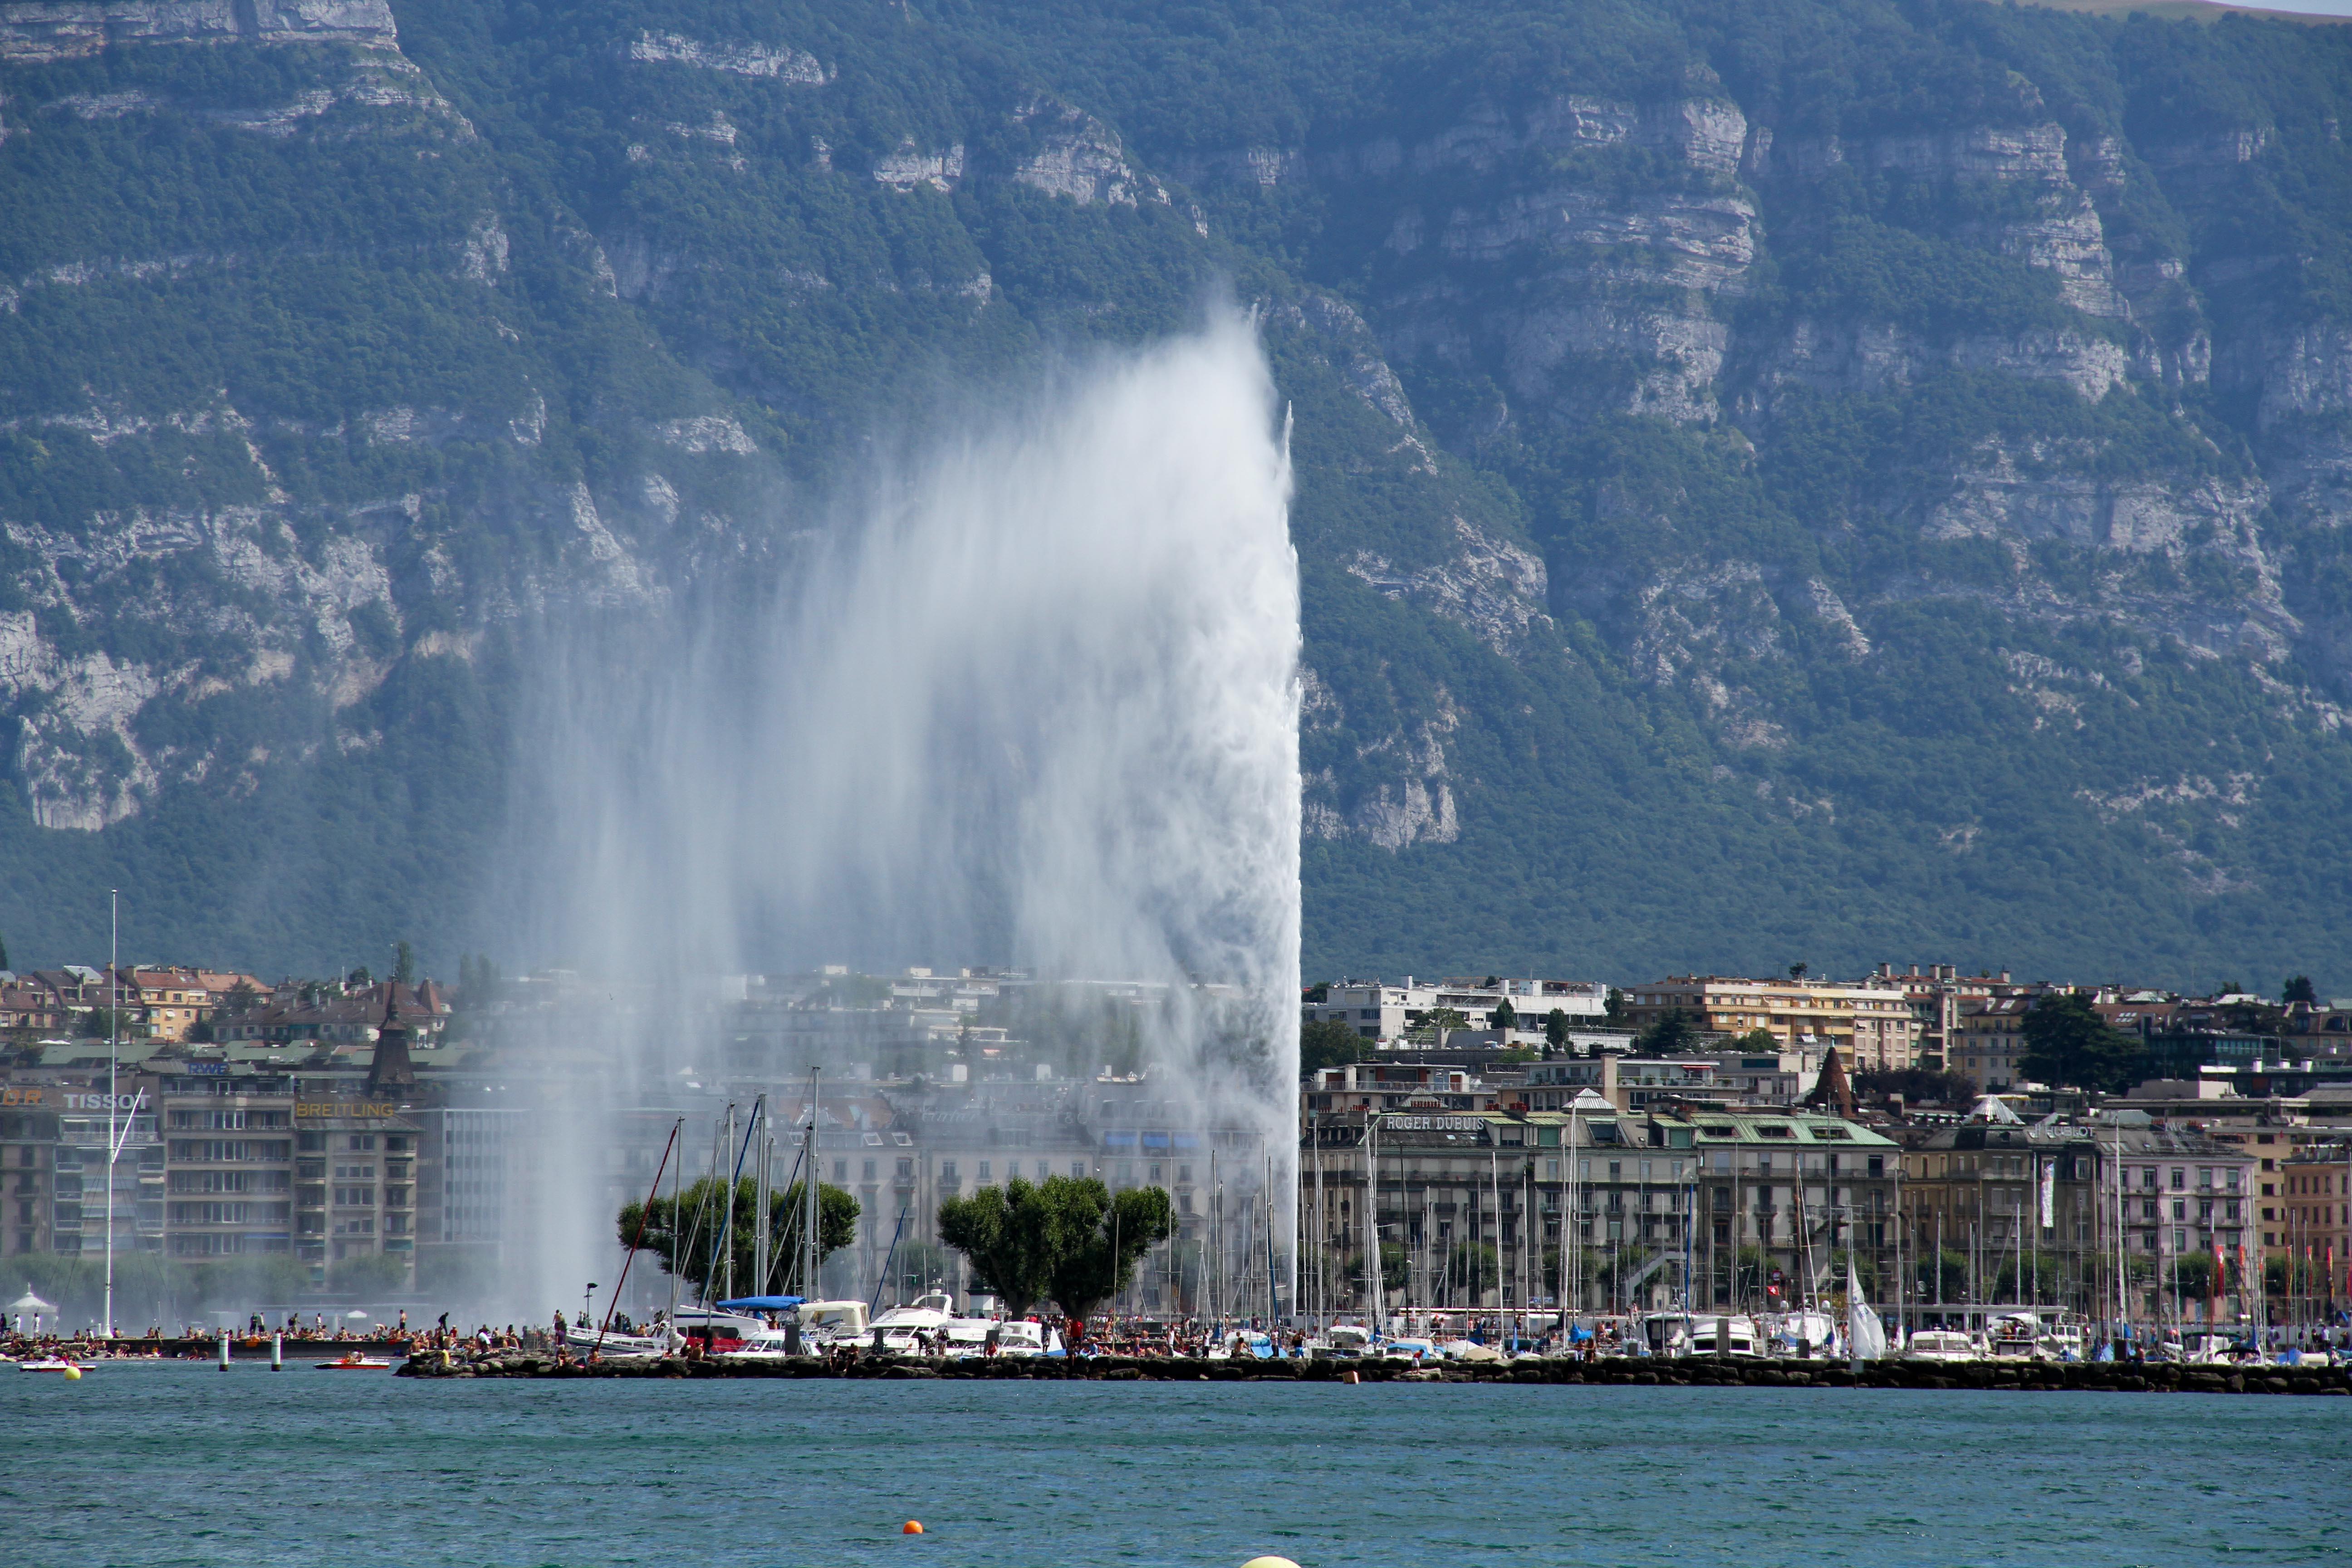 File:Geneva Fountain.jpg - Wikimedia Commons